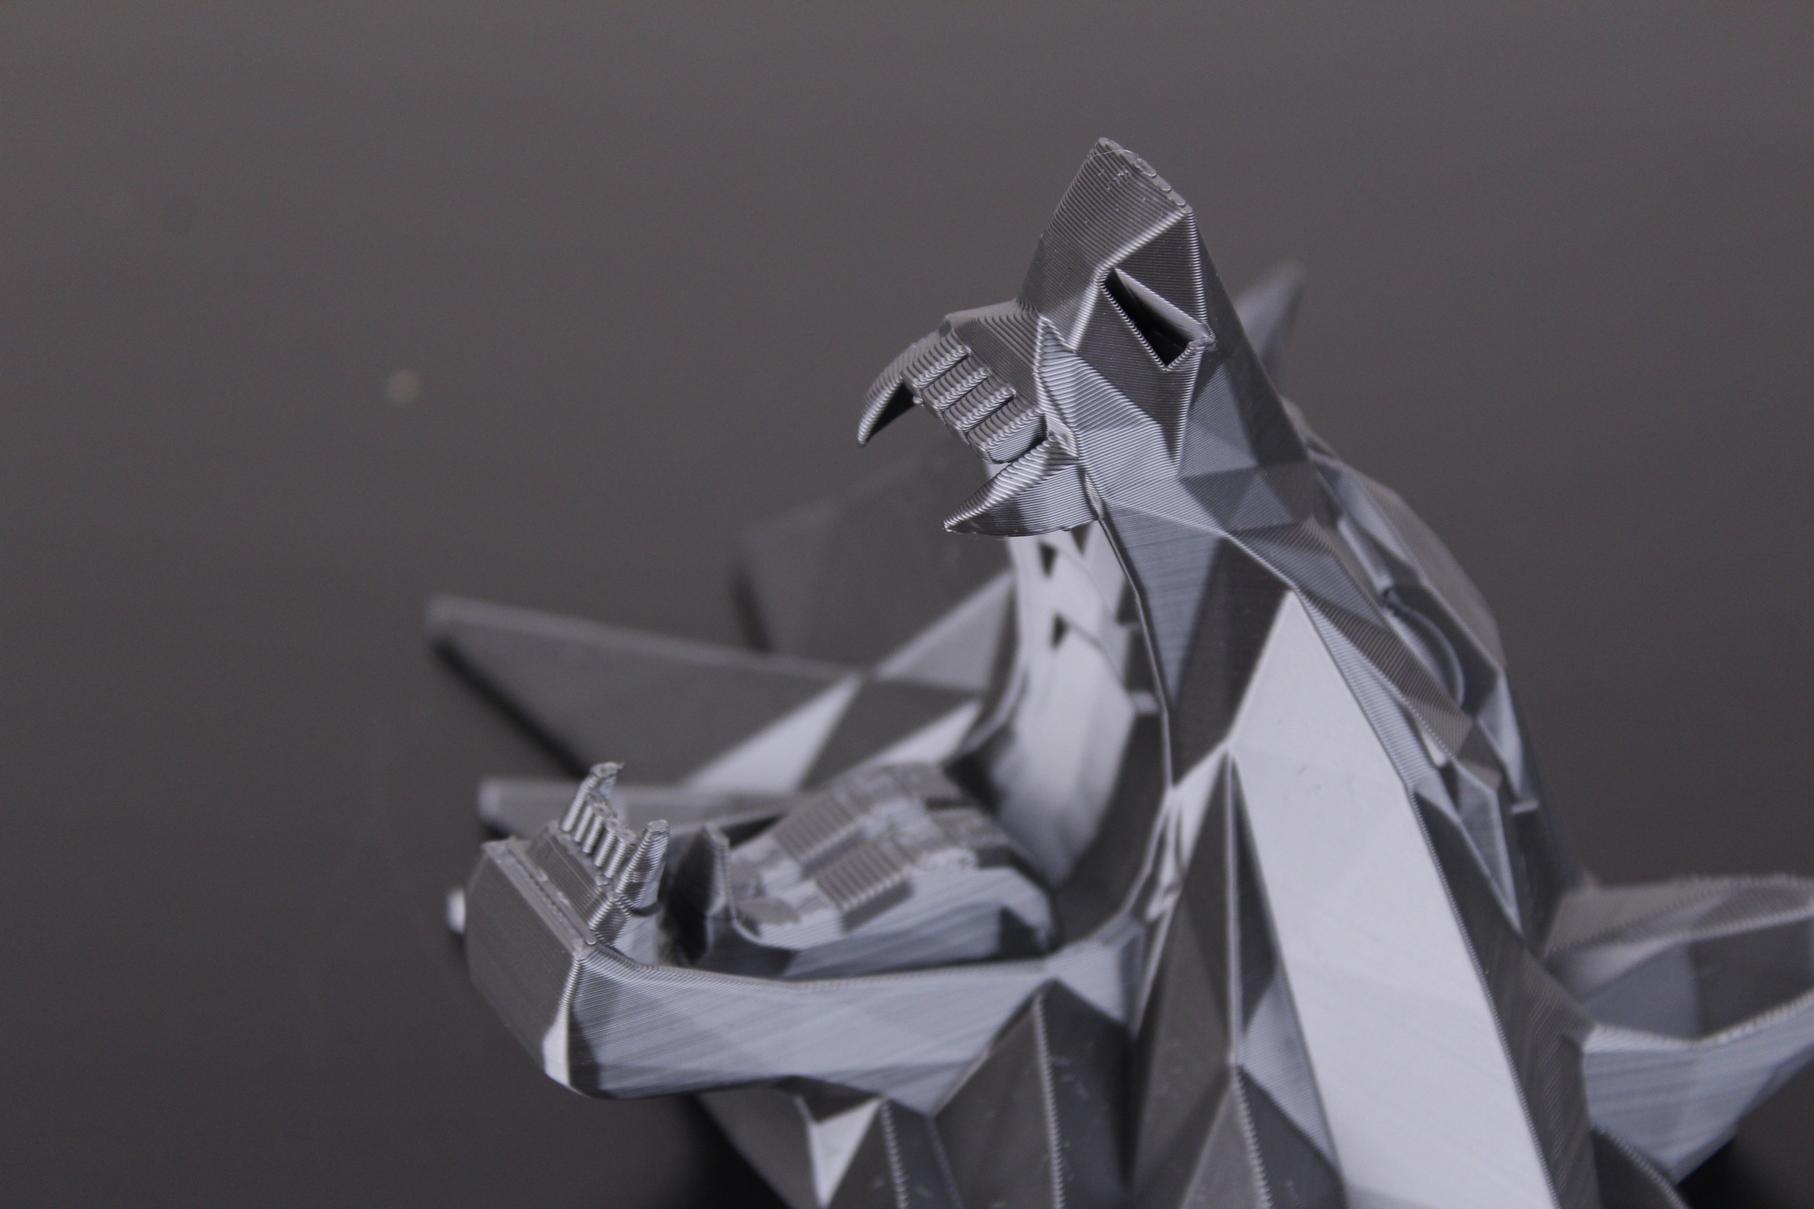 Witcher Wolf Medallion 2 | Trianglelab Spiral Tower Hotend Review